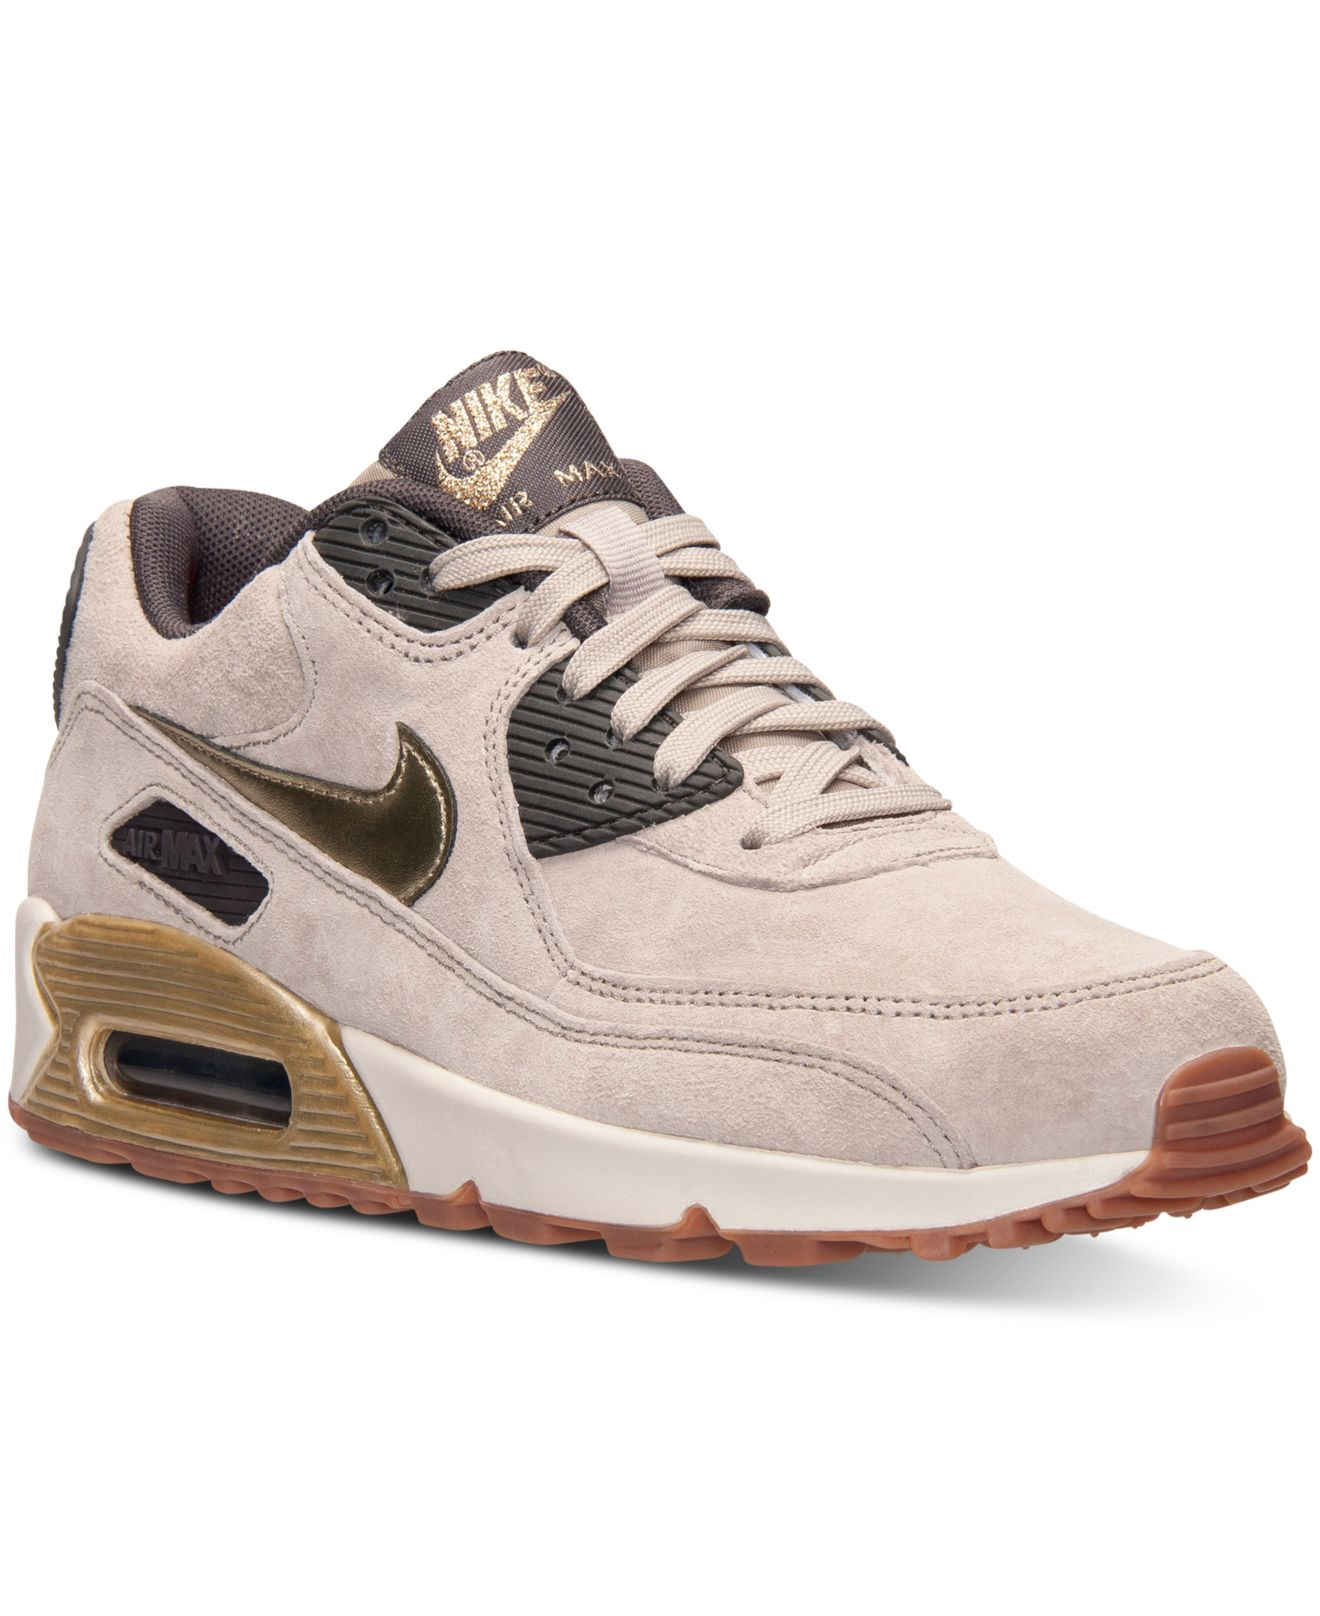 Running Shoes Began